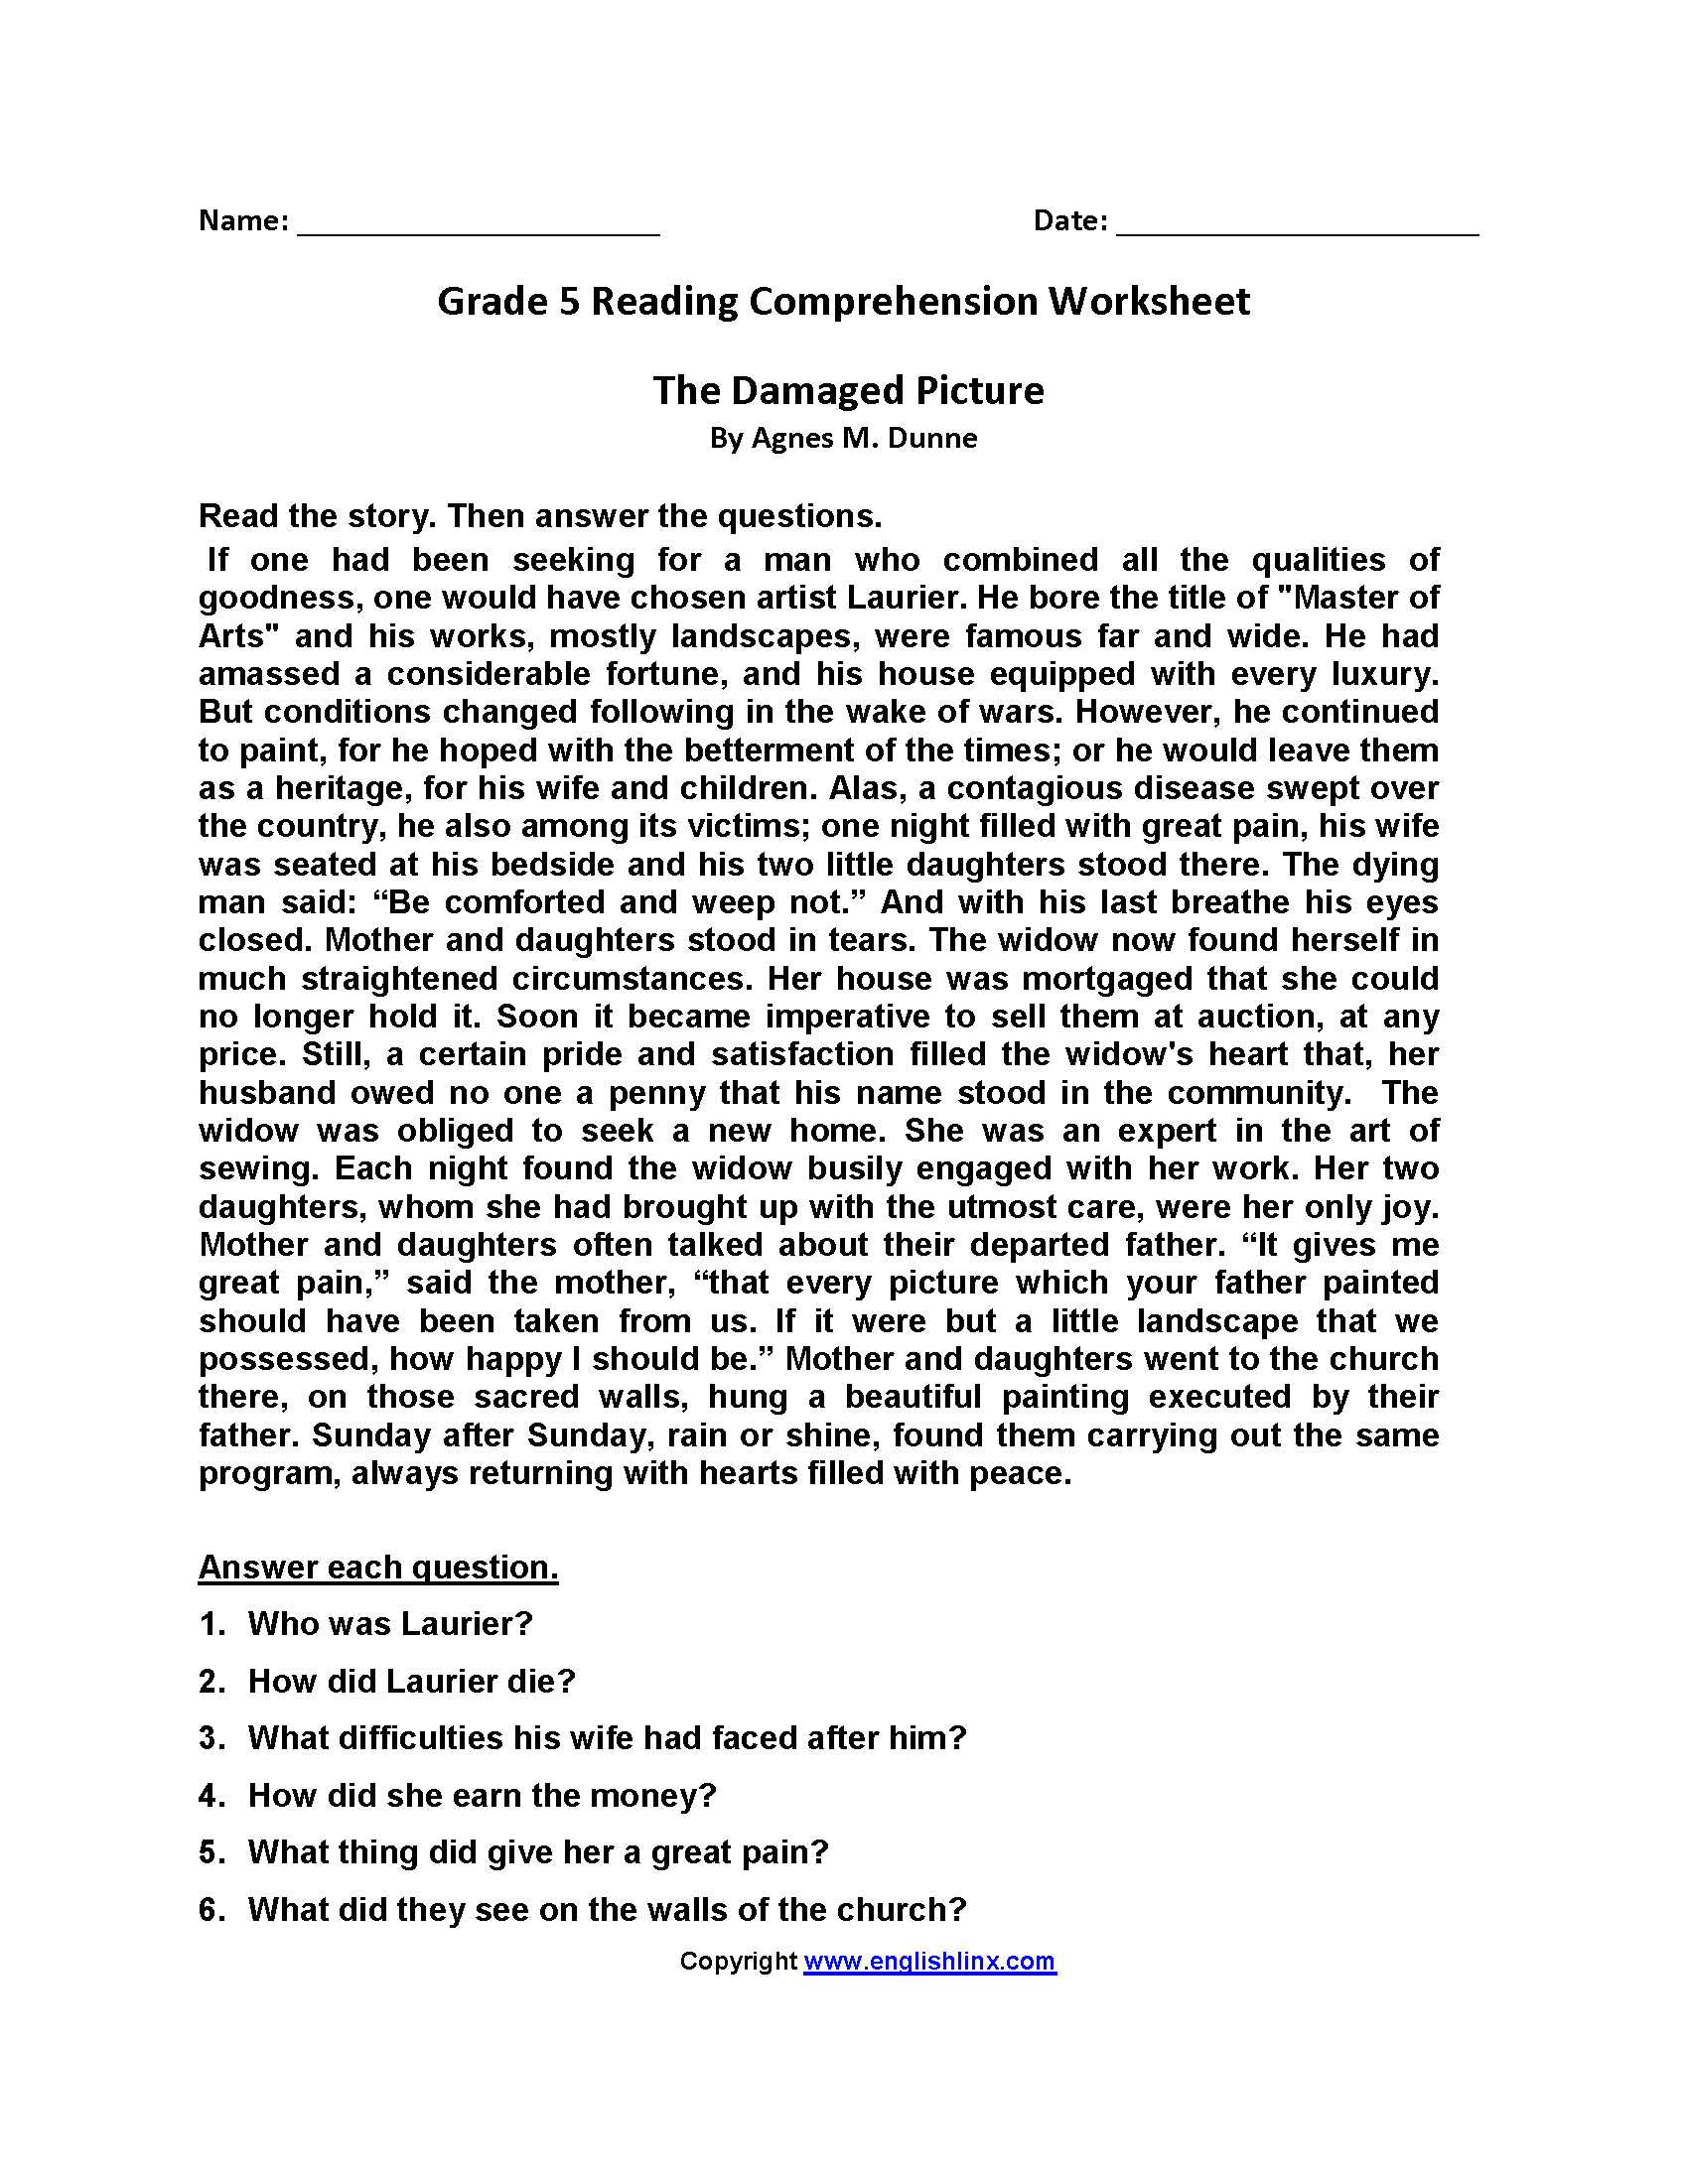 medium resolution of Damaged Picture Fifth Grade Reading Worksheets   Reading comprehension  worksheets